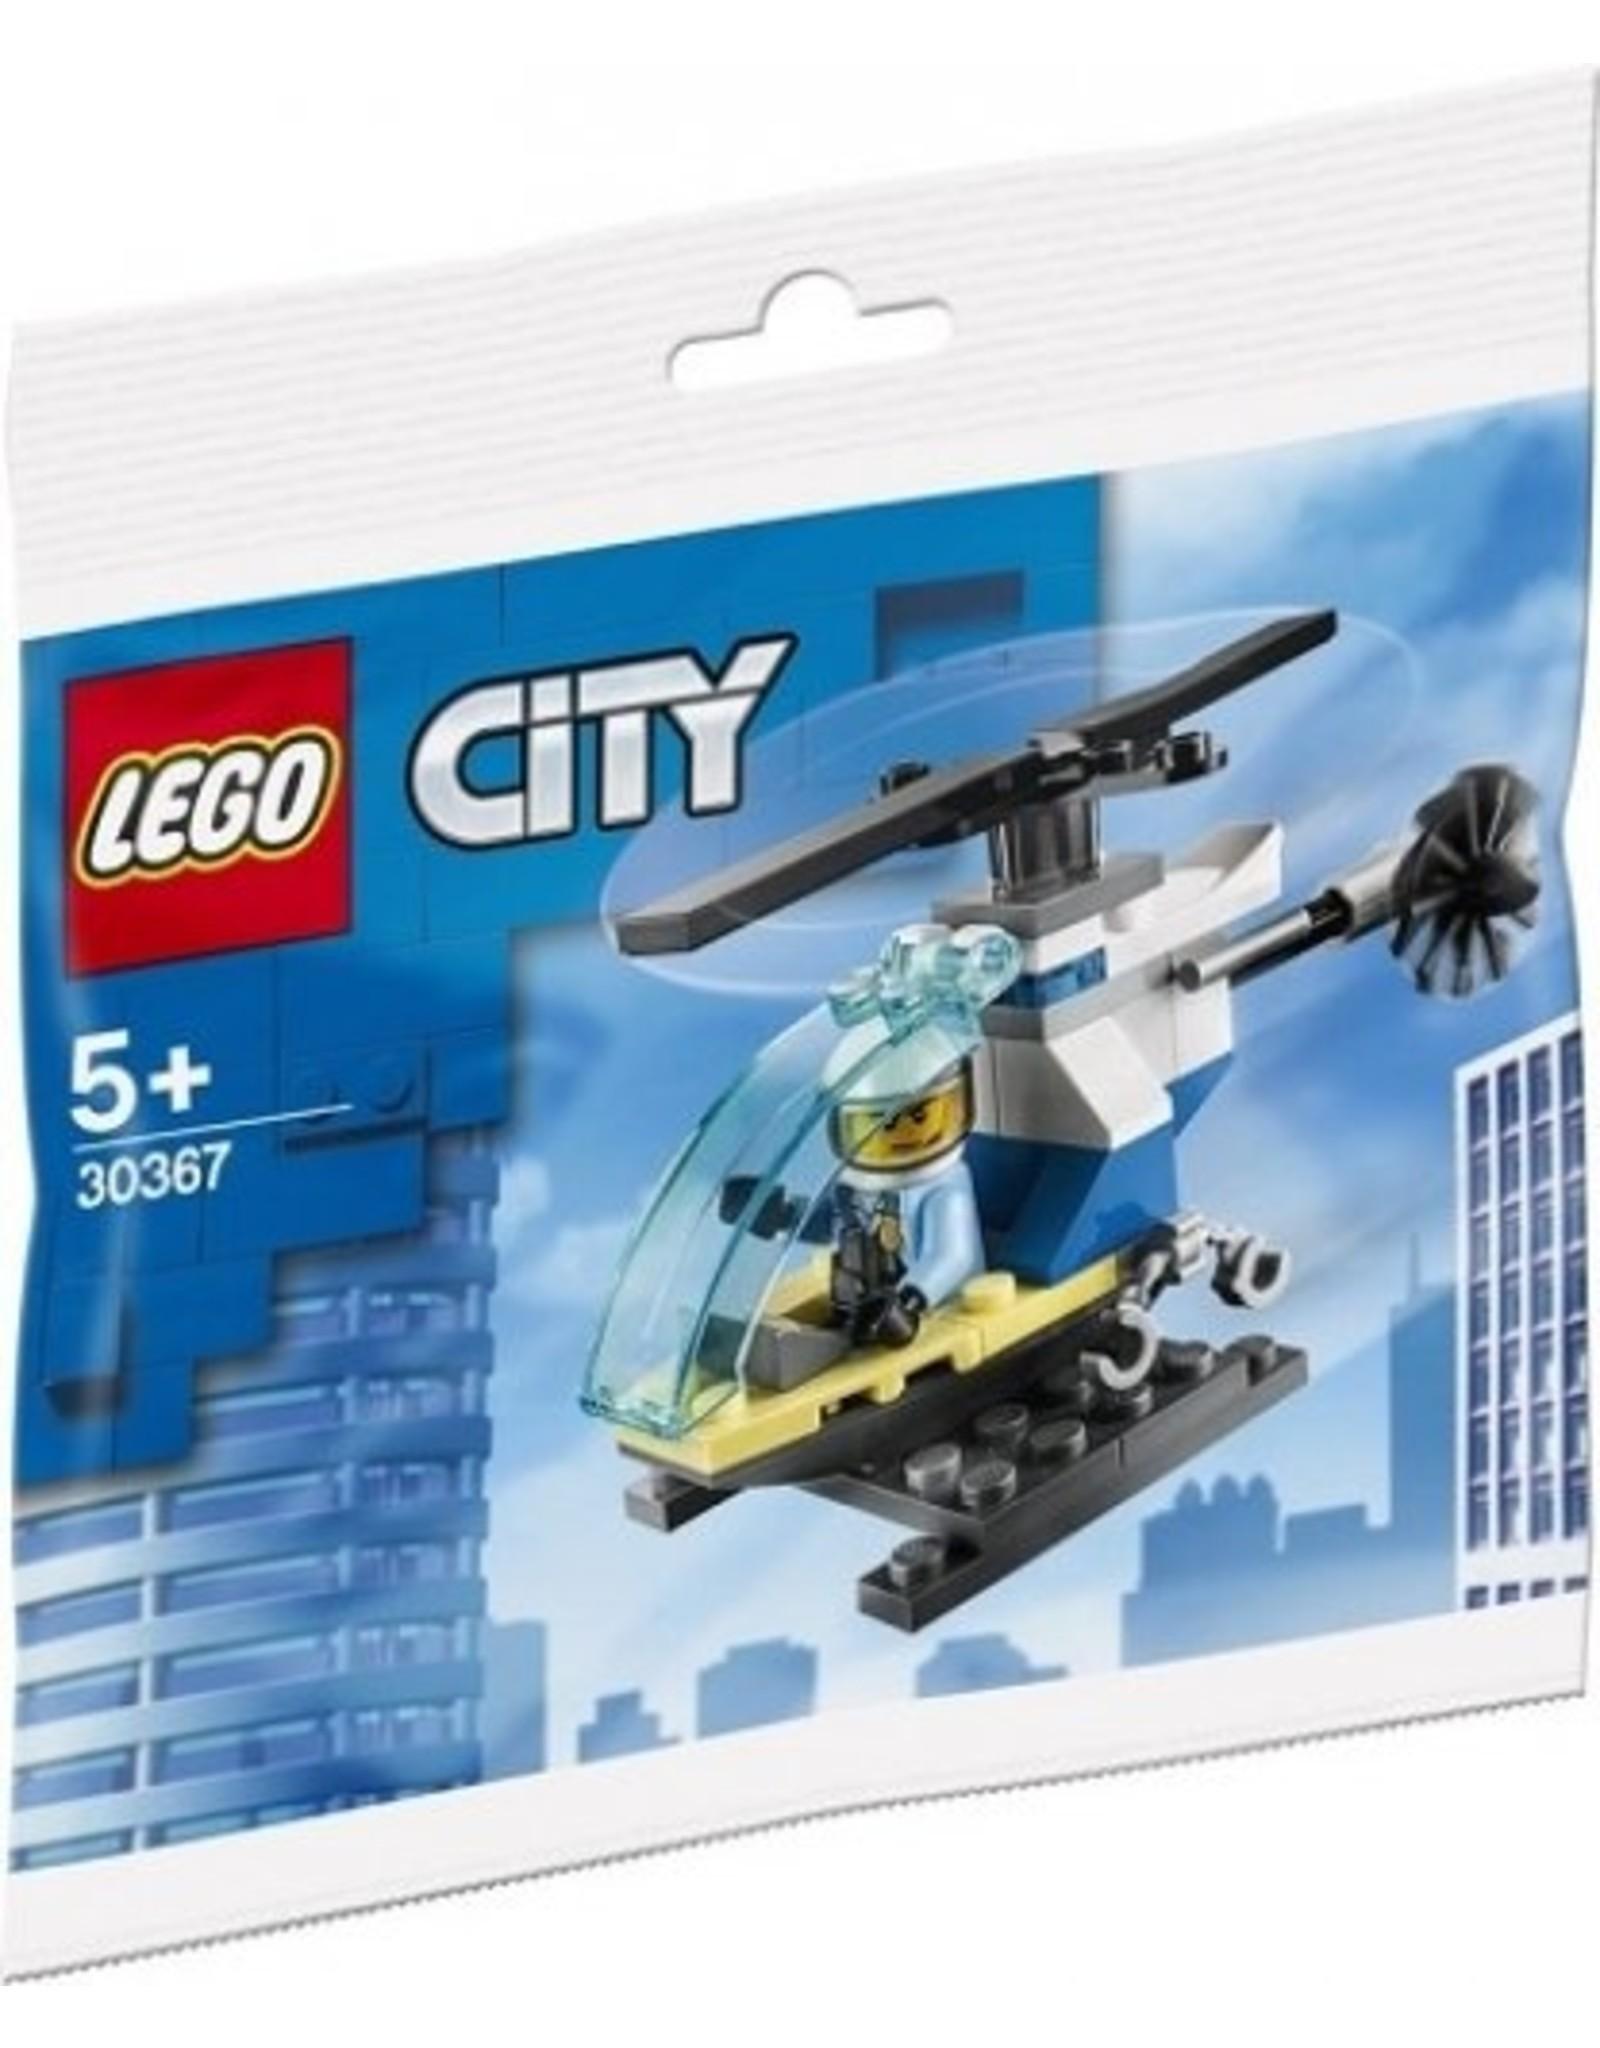 LEGO LEGO City 30367 Politiehelicopter (Polybag)